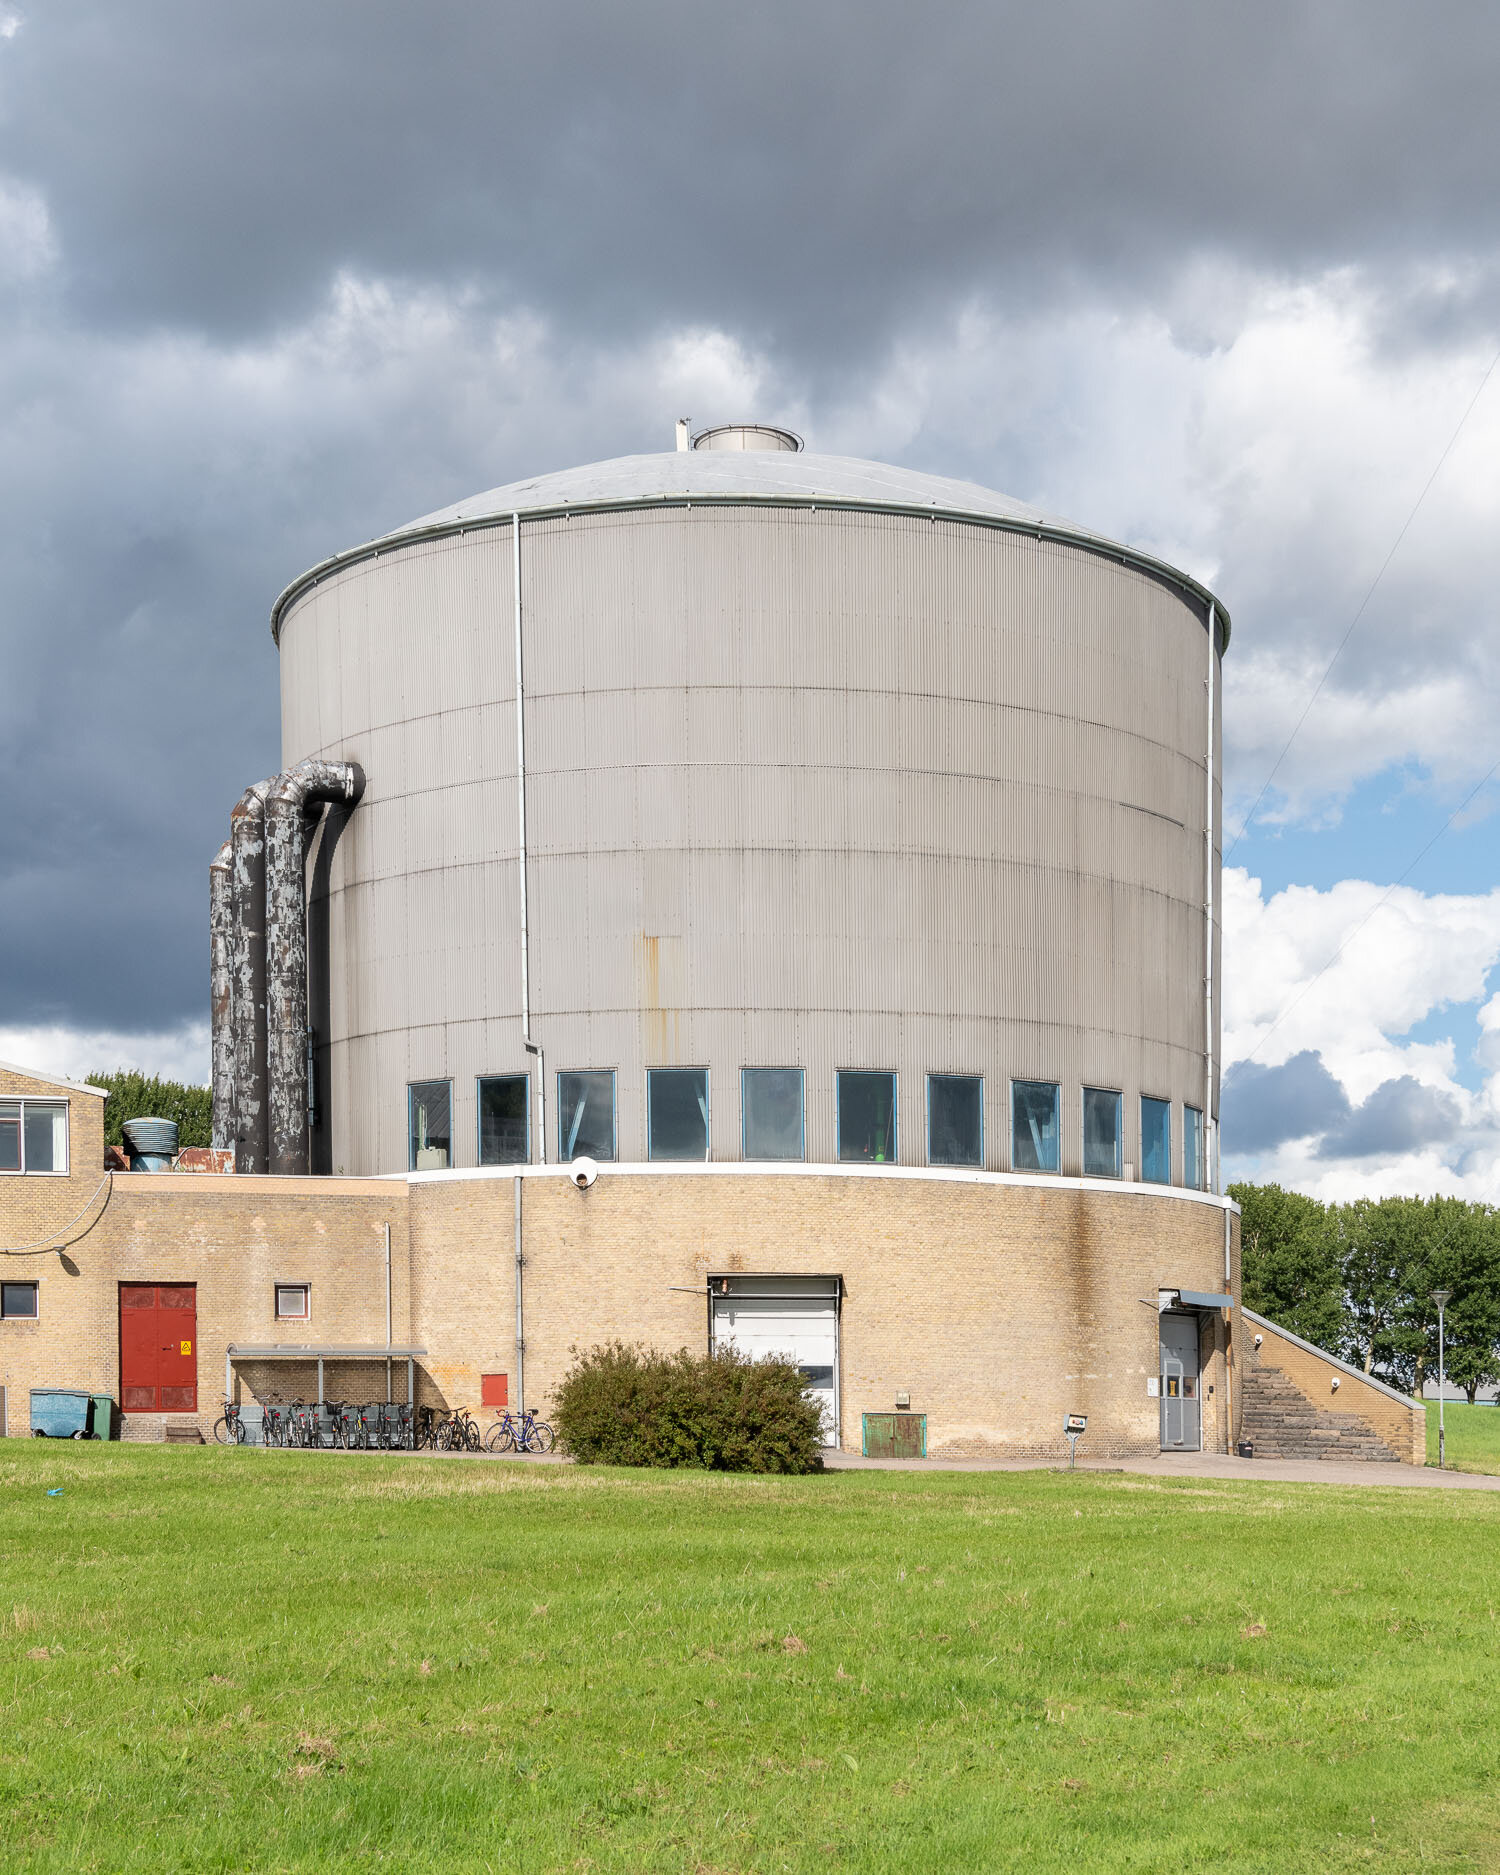 Dansk Reactor 2, built in 1958 and closed in 1975